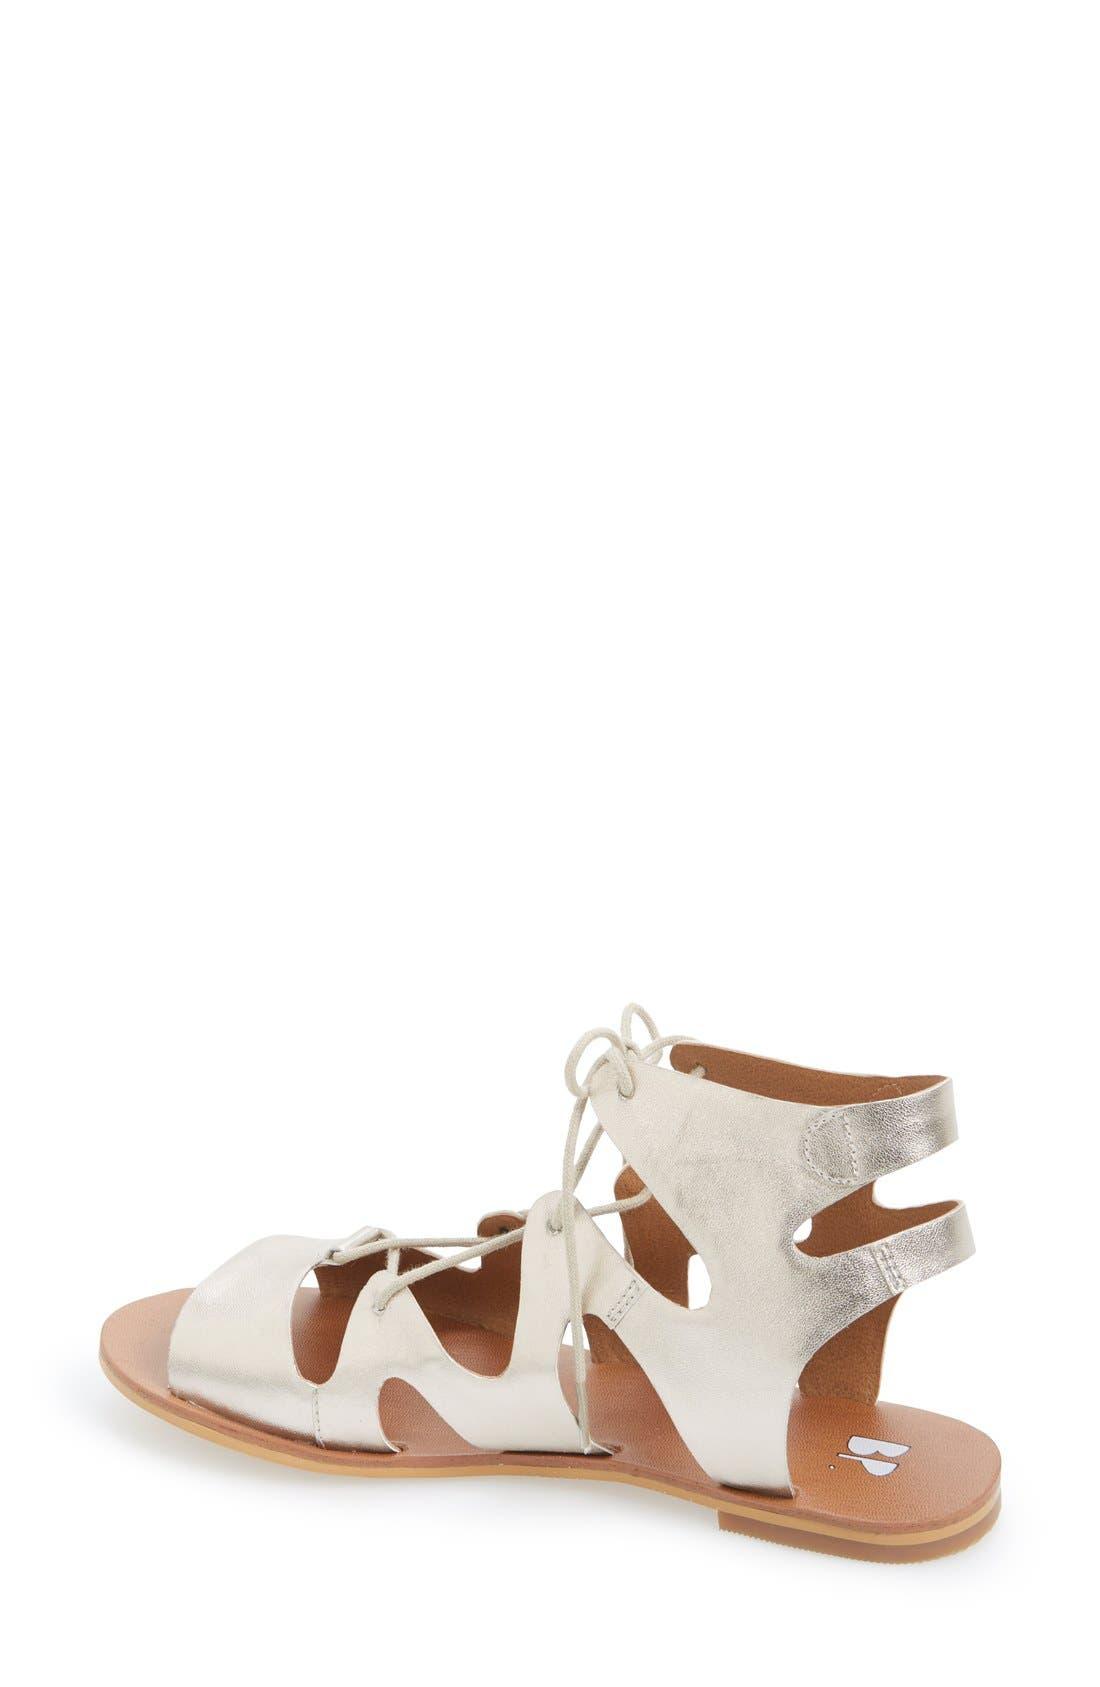 'Alyona' Lace-Up Gladiator Sandal,                             Alternate thumbnail 2, color,                             Platinum Faux Leather